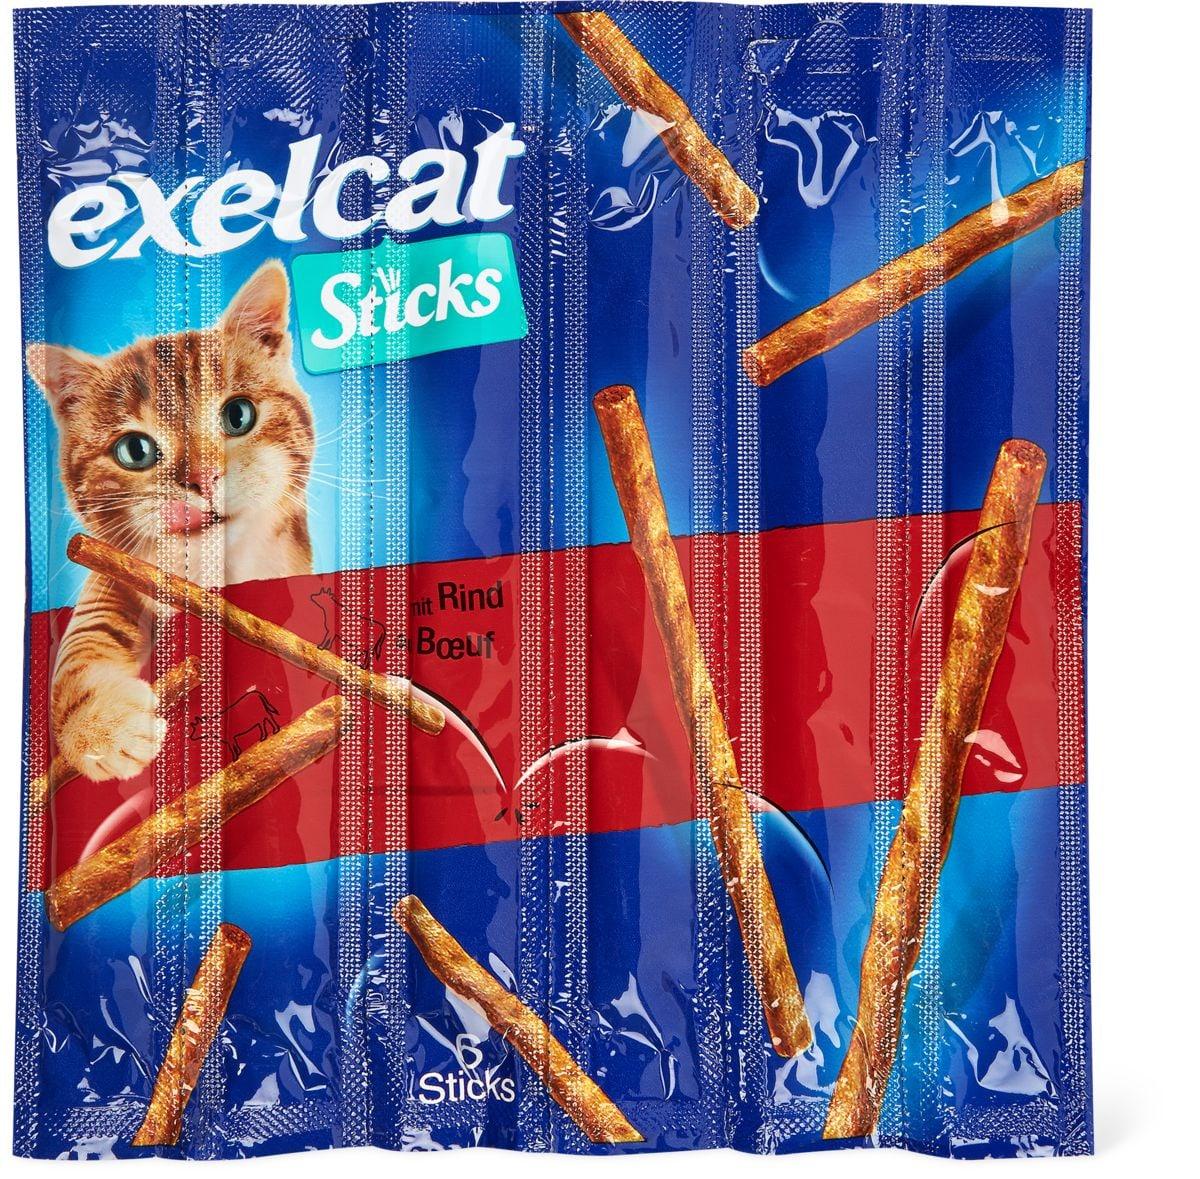 Exelcat Sticks boeuf